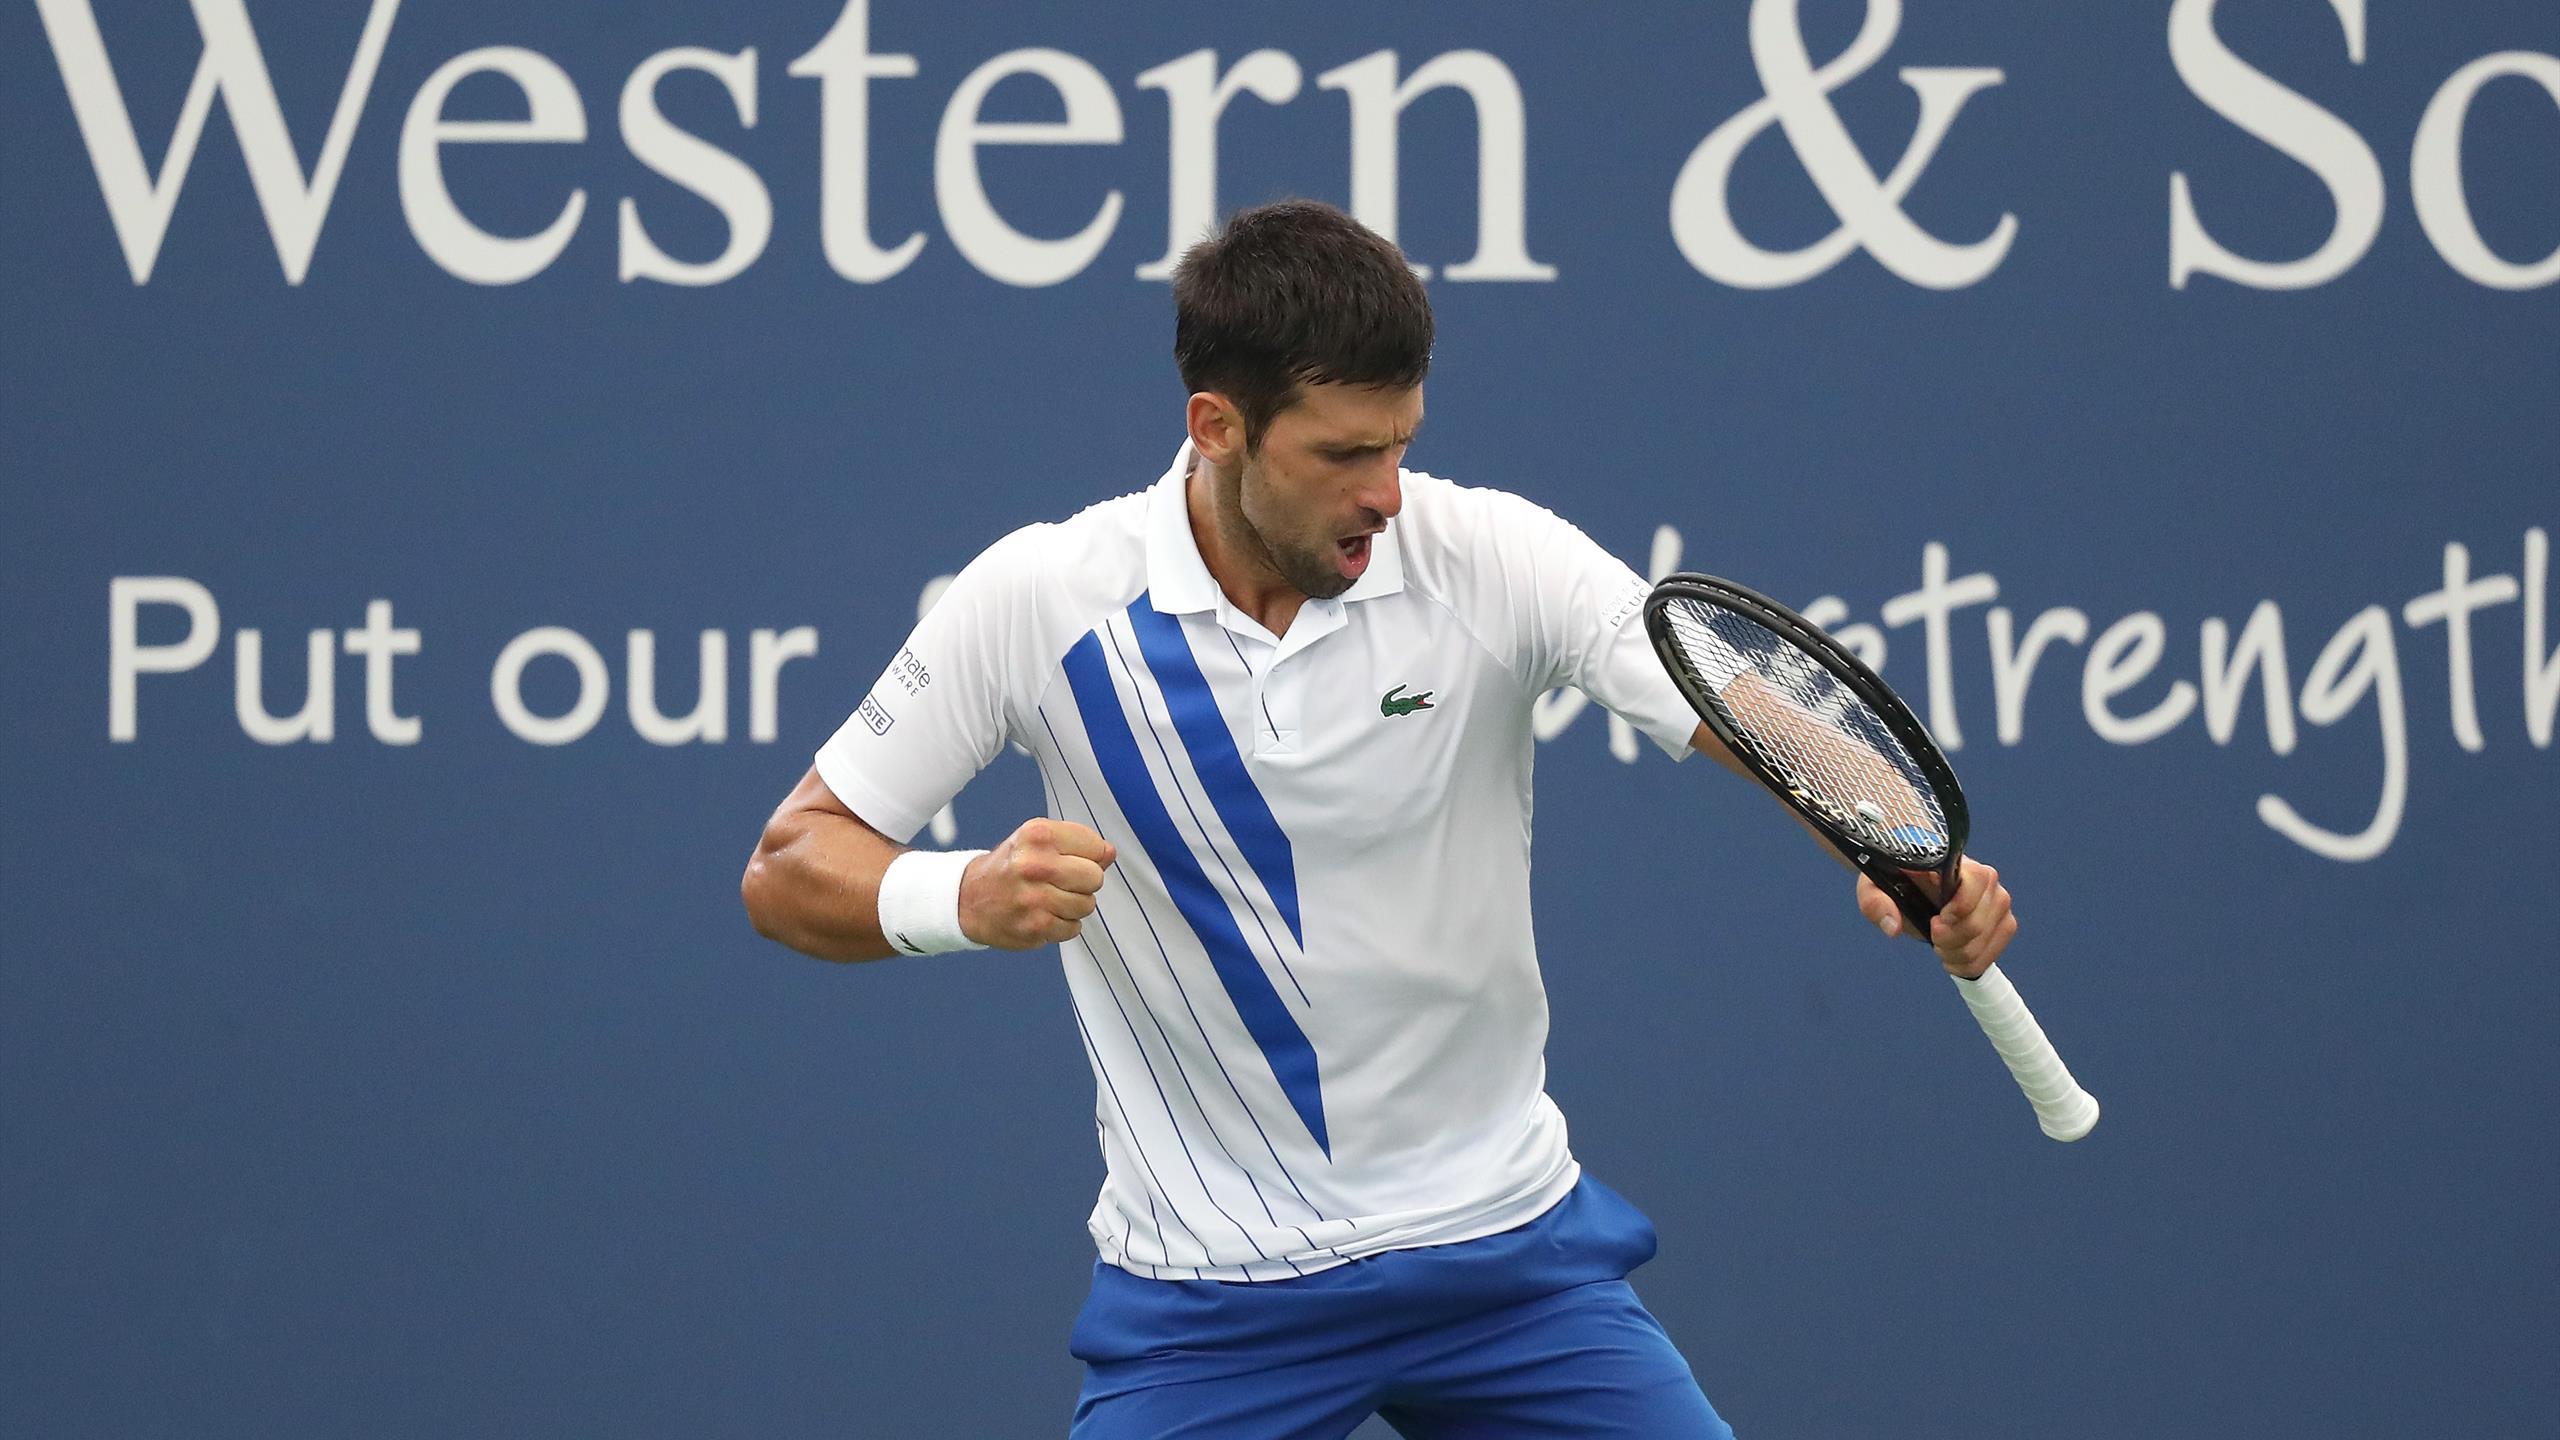 Novak Djokovic Wins Western Southern Open After Three Sets Victory Over Milos Raonic Eurosport